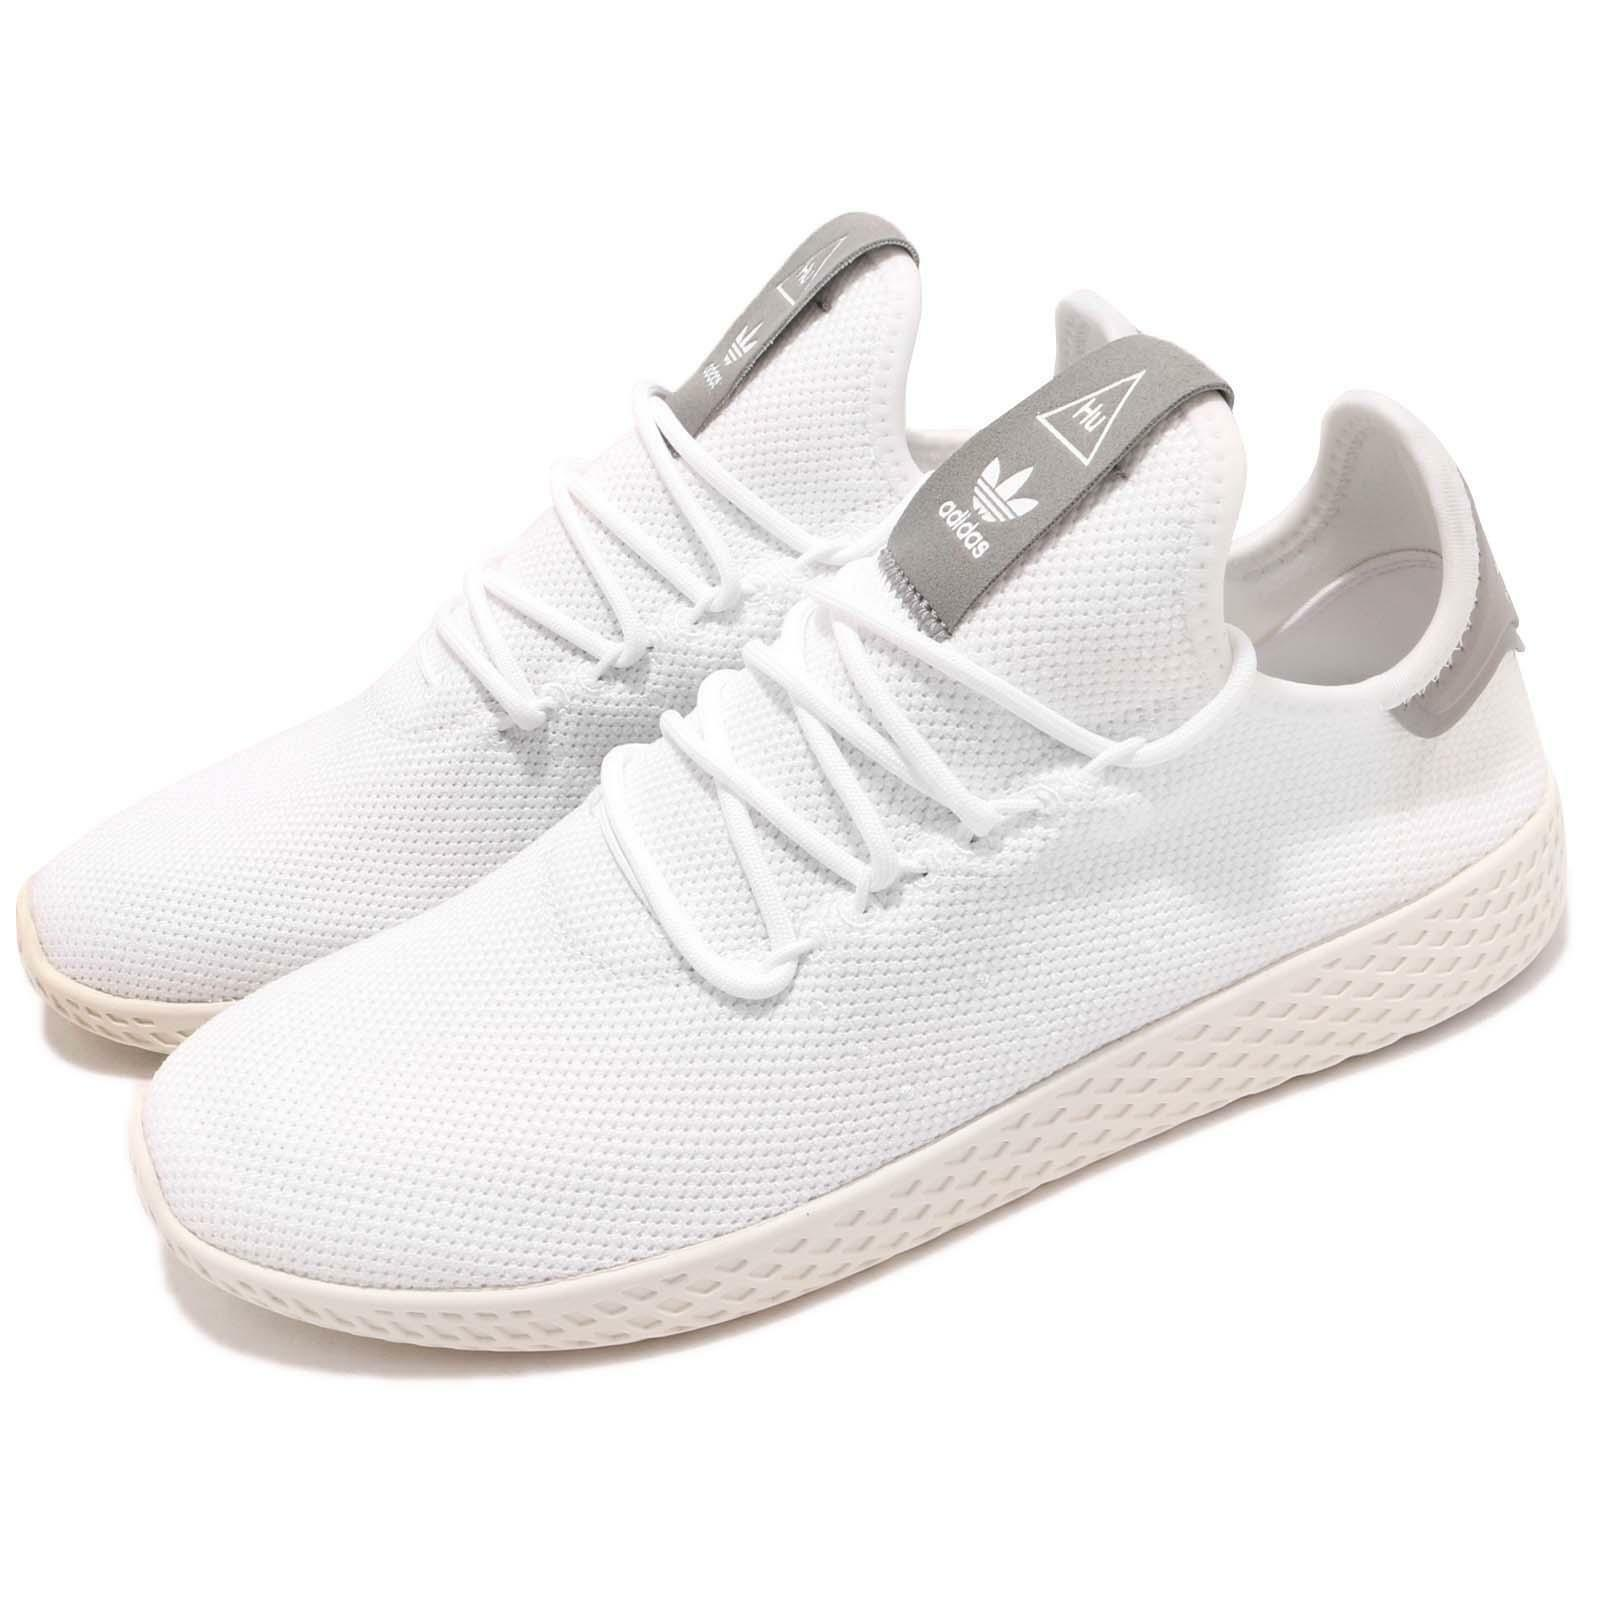 adidas Originals PW Tennis Hu Pharrell Williams Blanc Gris Homme Chaussures B41793